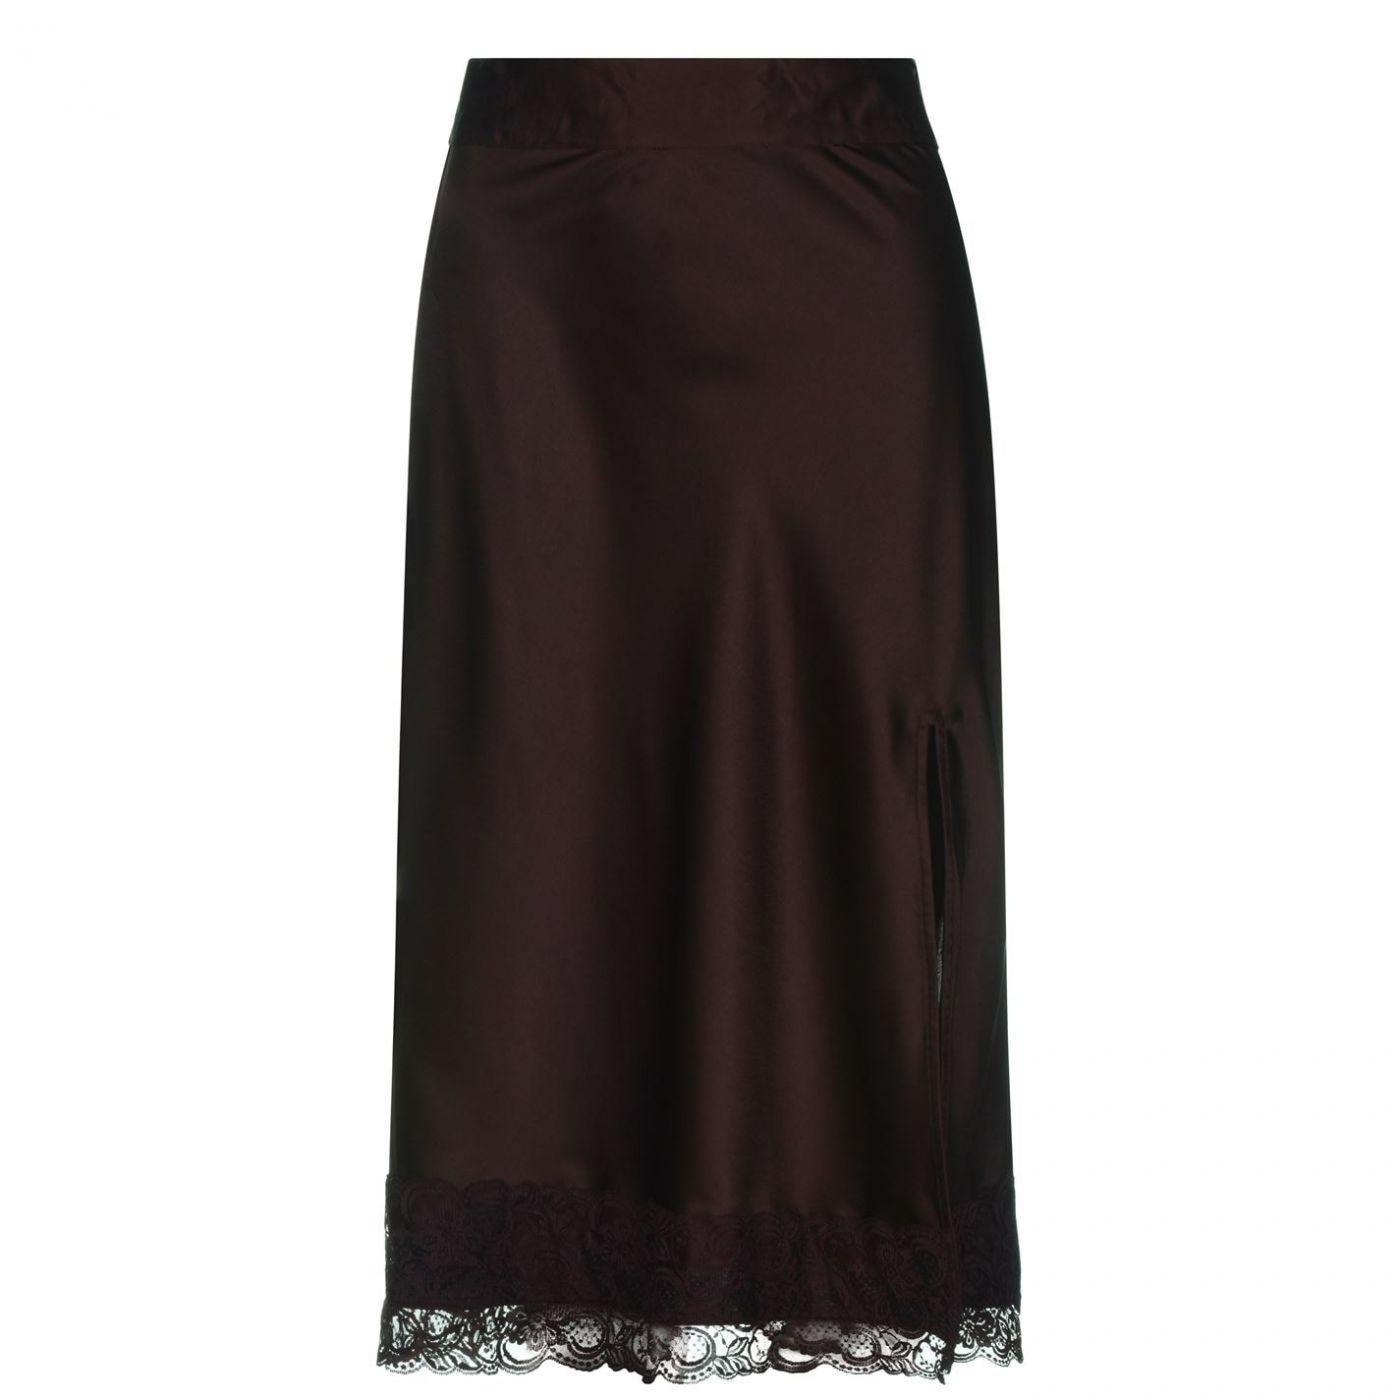 Vero Moda HW Mya Skirt